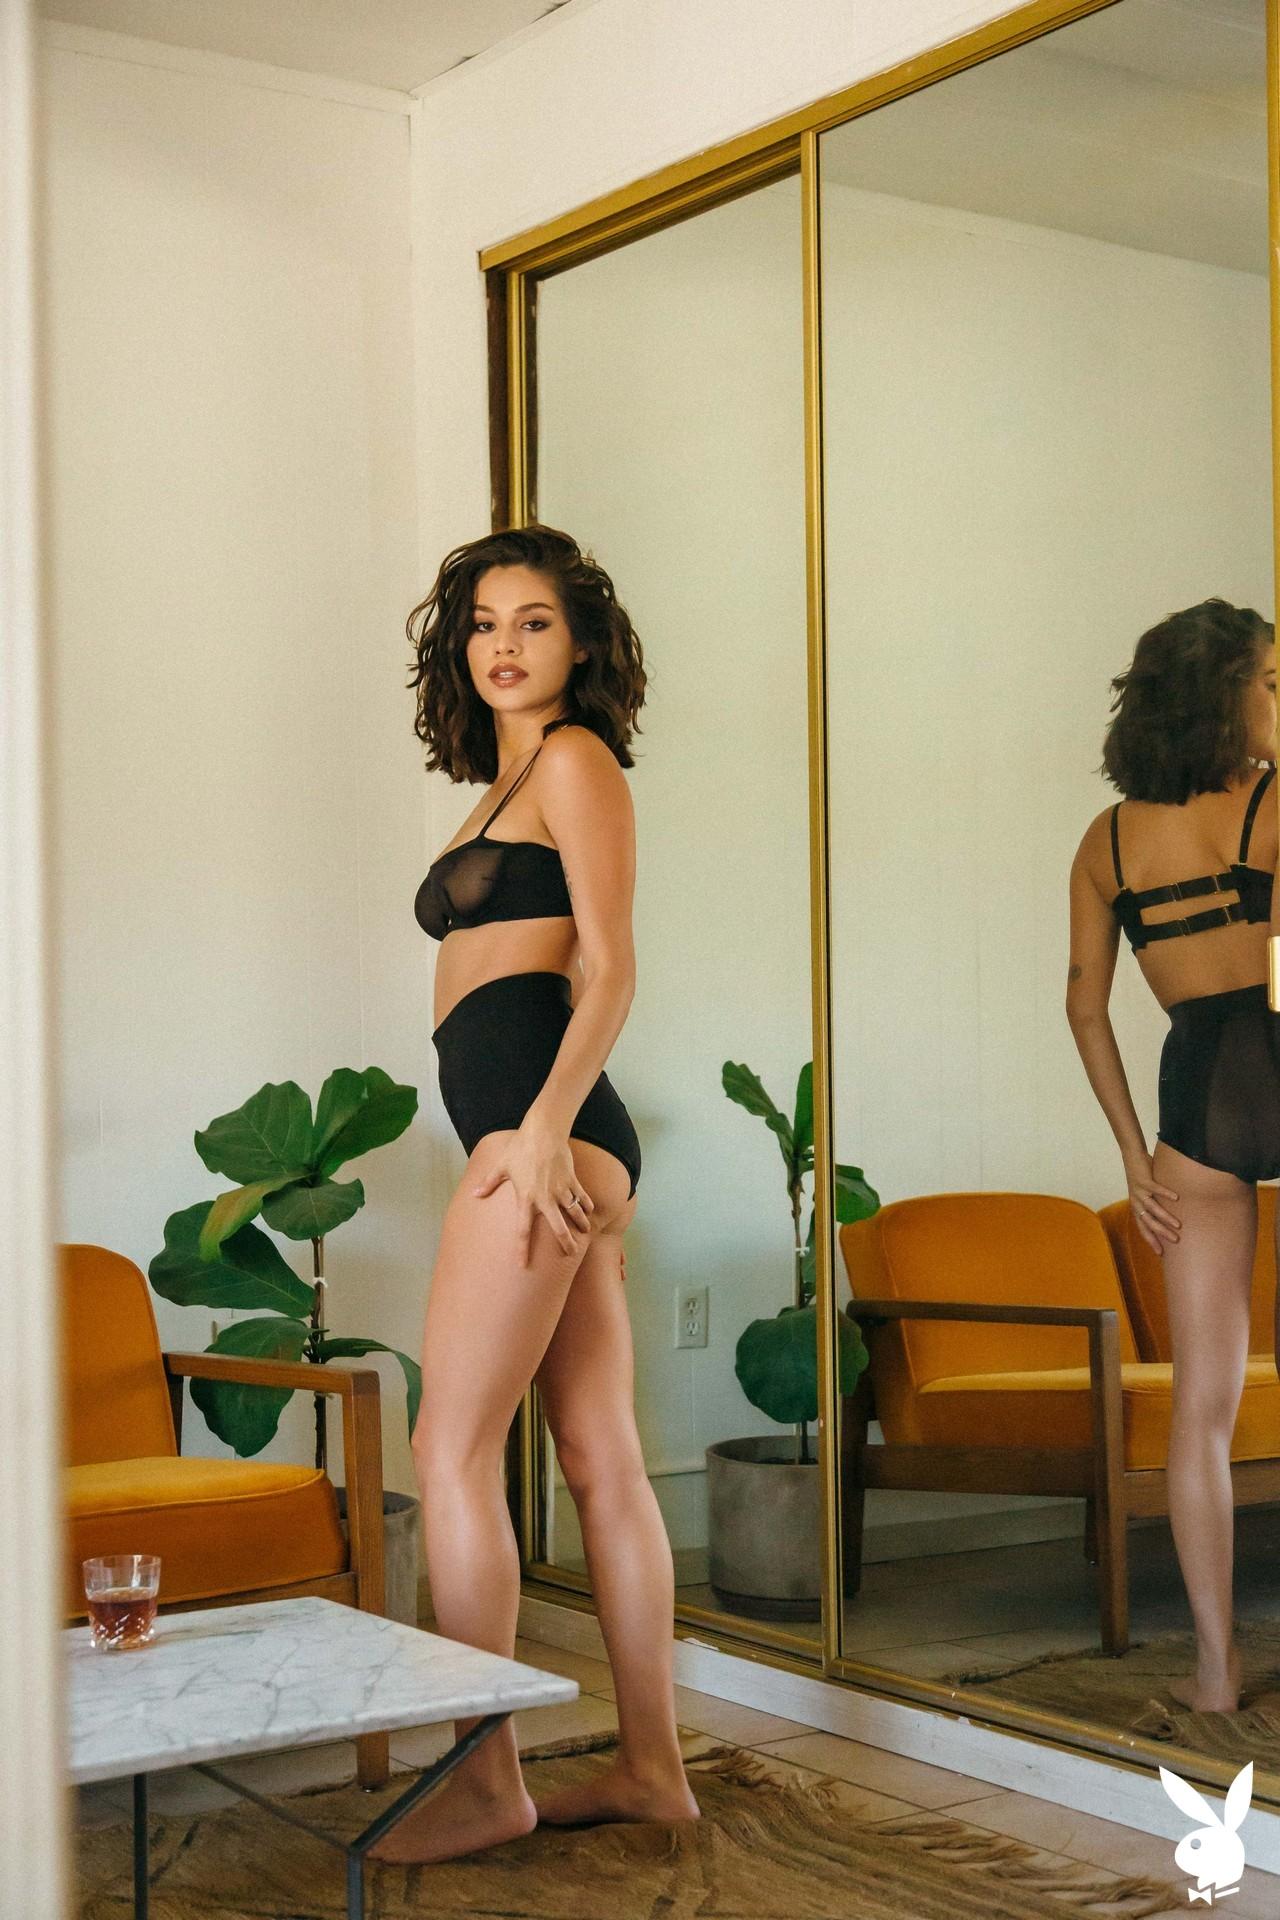 Natalie Del Real In The Simple Things Playboy Plus (3)